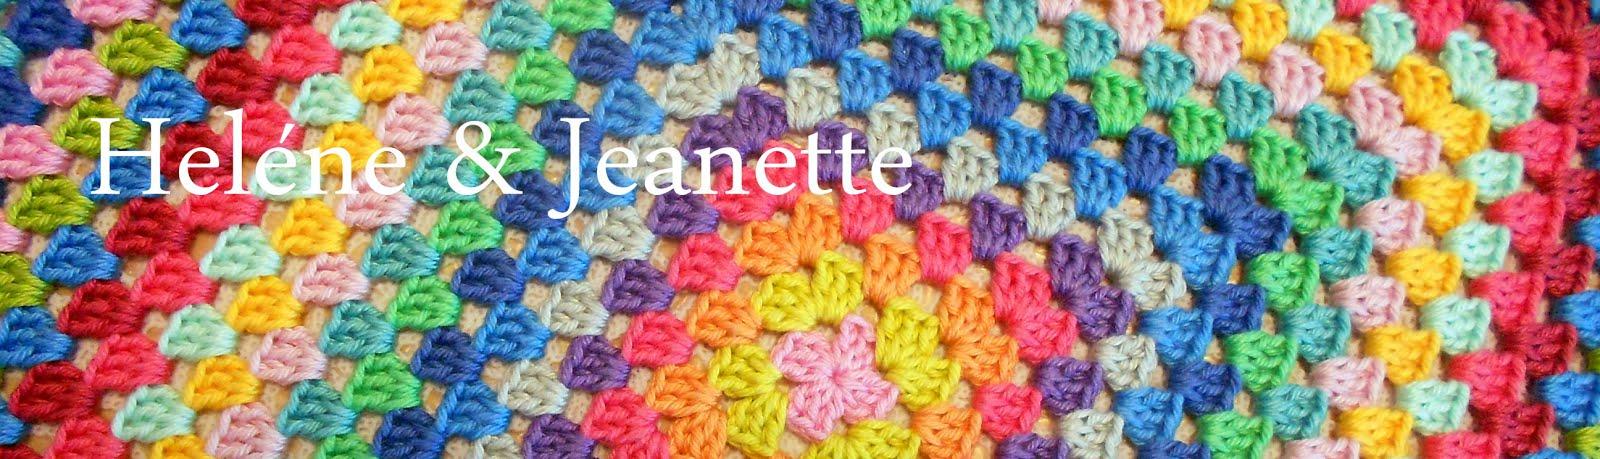 Heléne & Jeanette